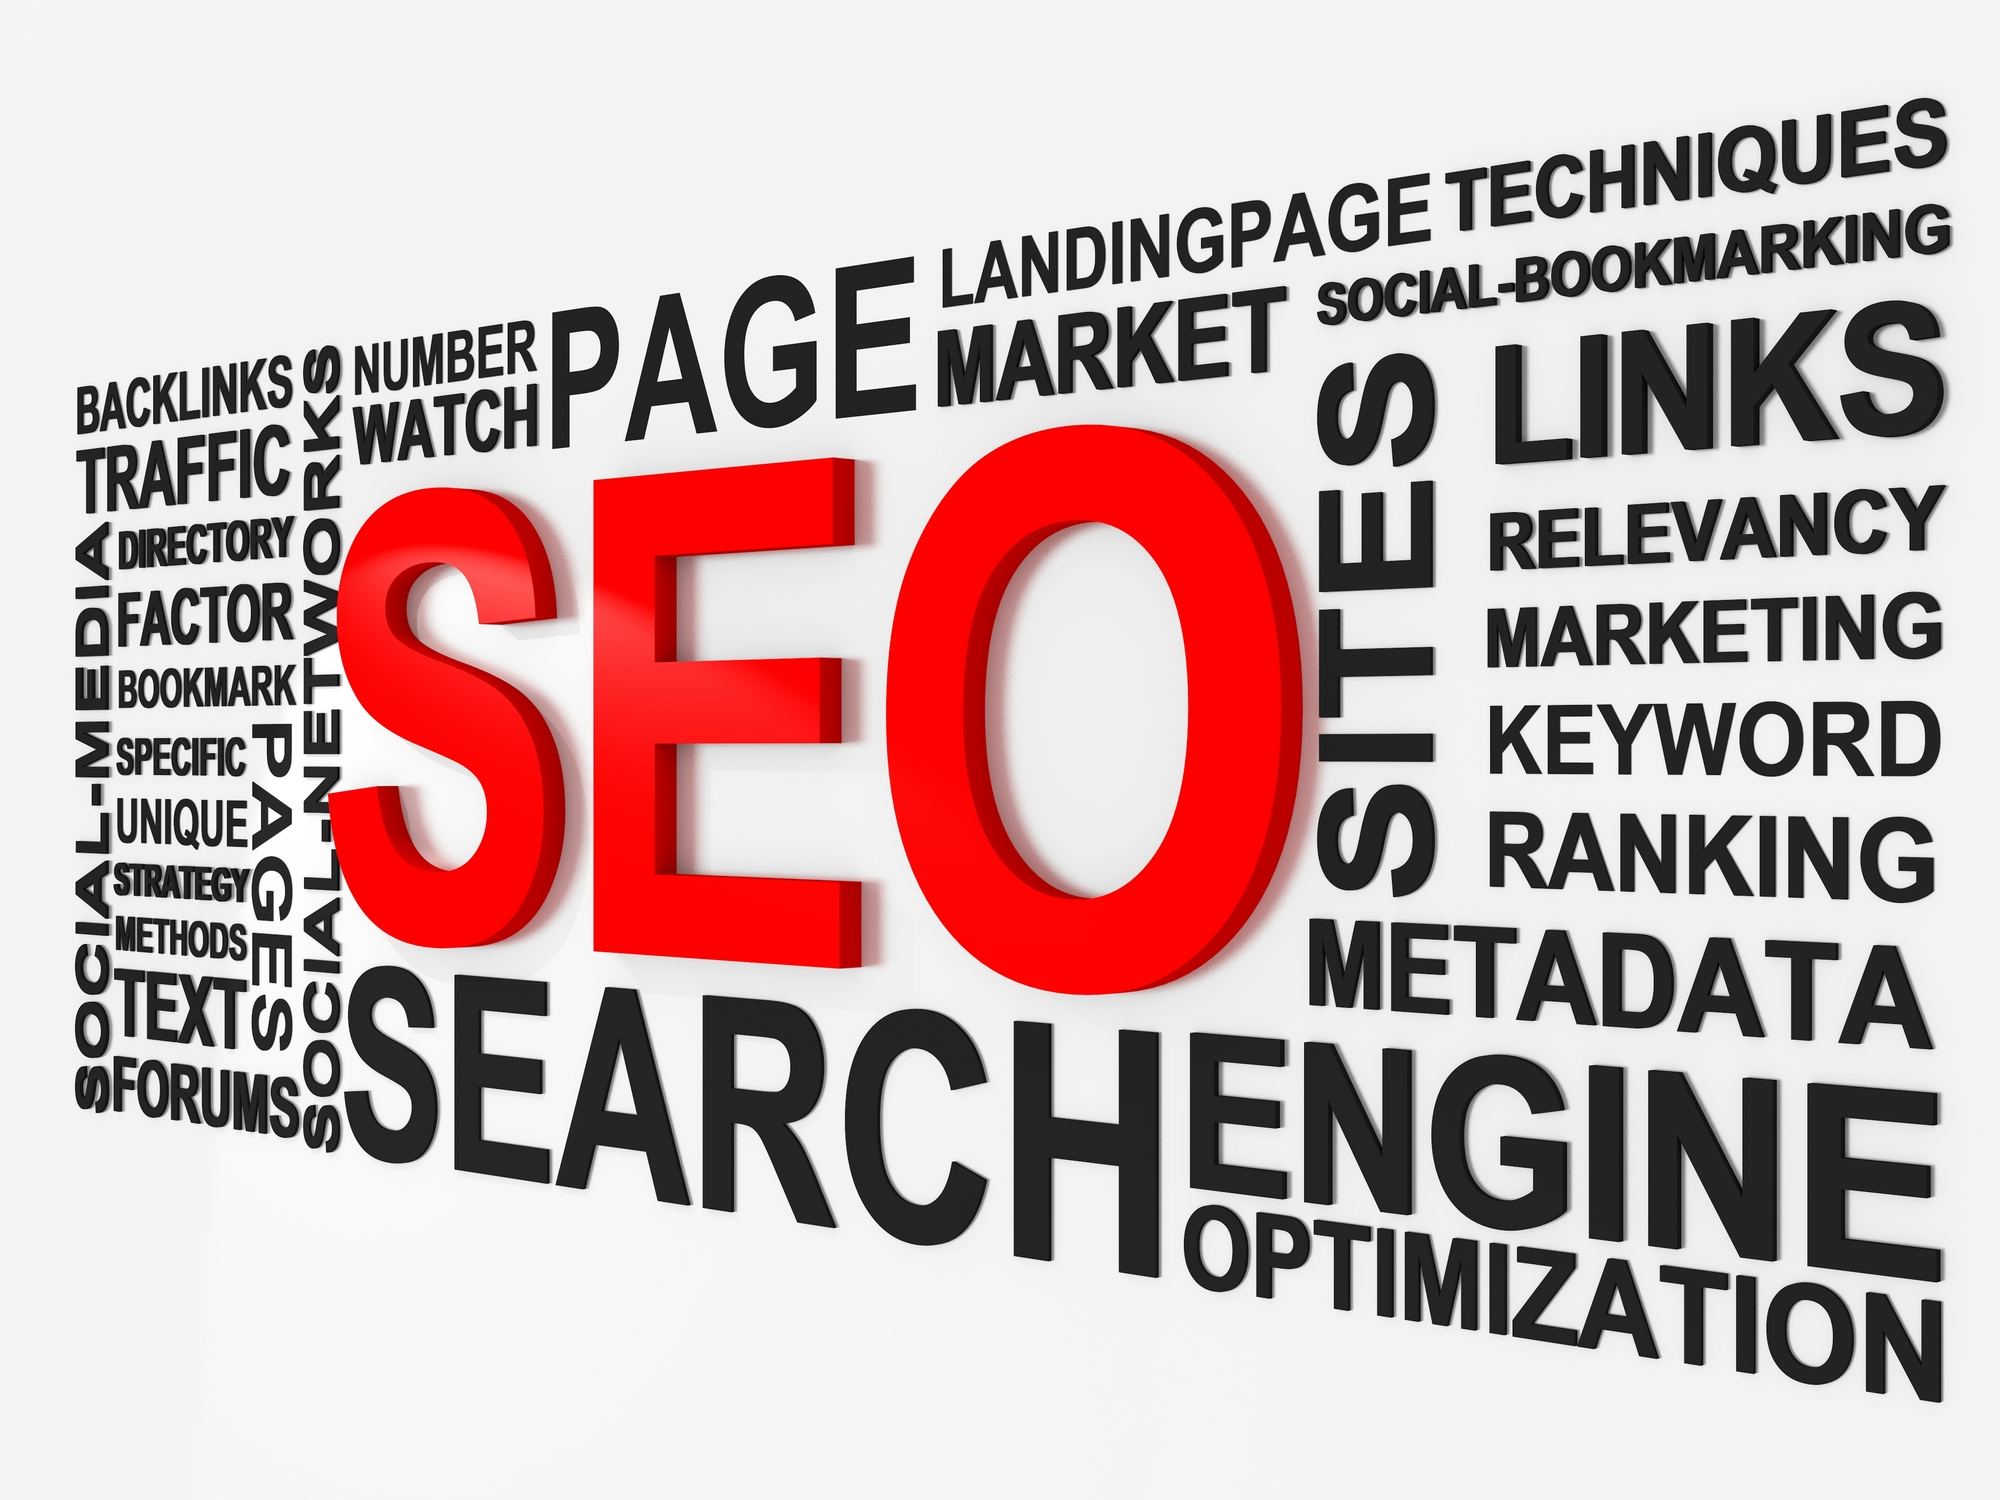 Repair+business+reputation+online+suppress+negative+search+results.jpg